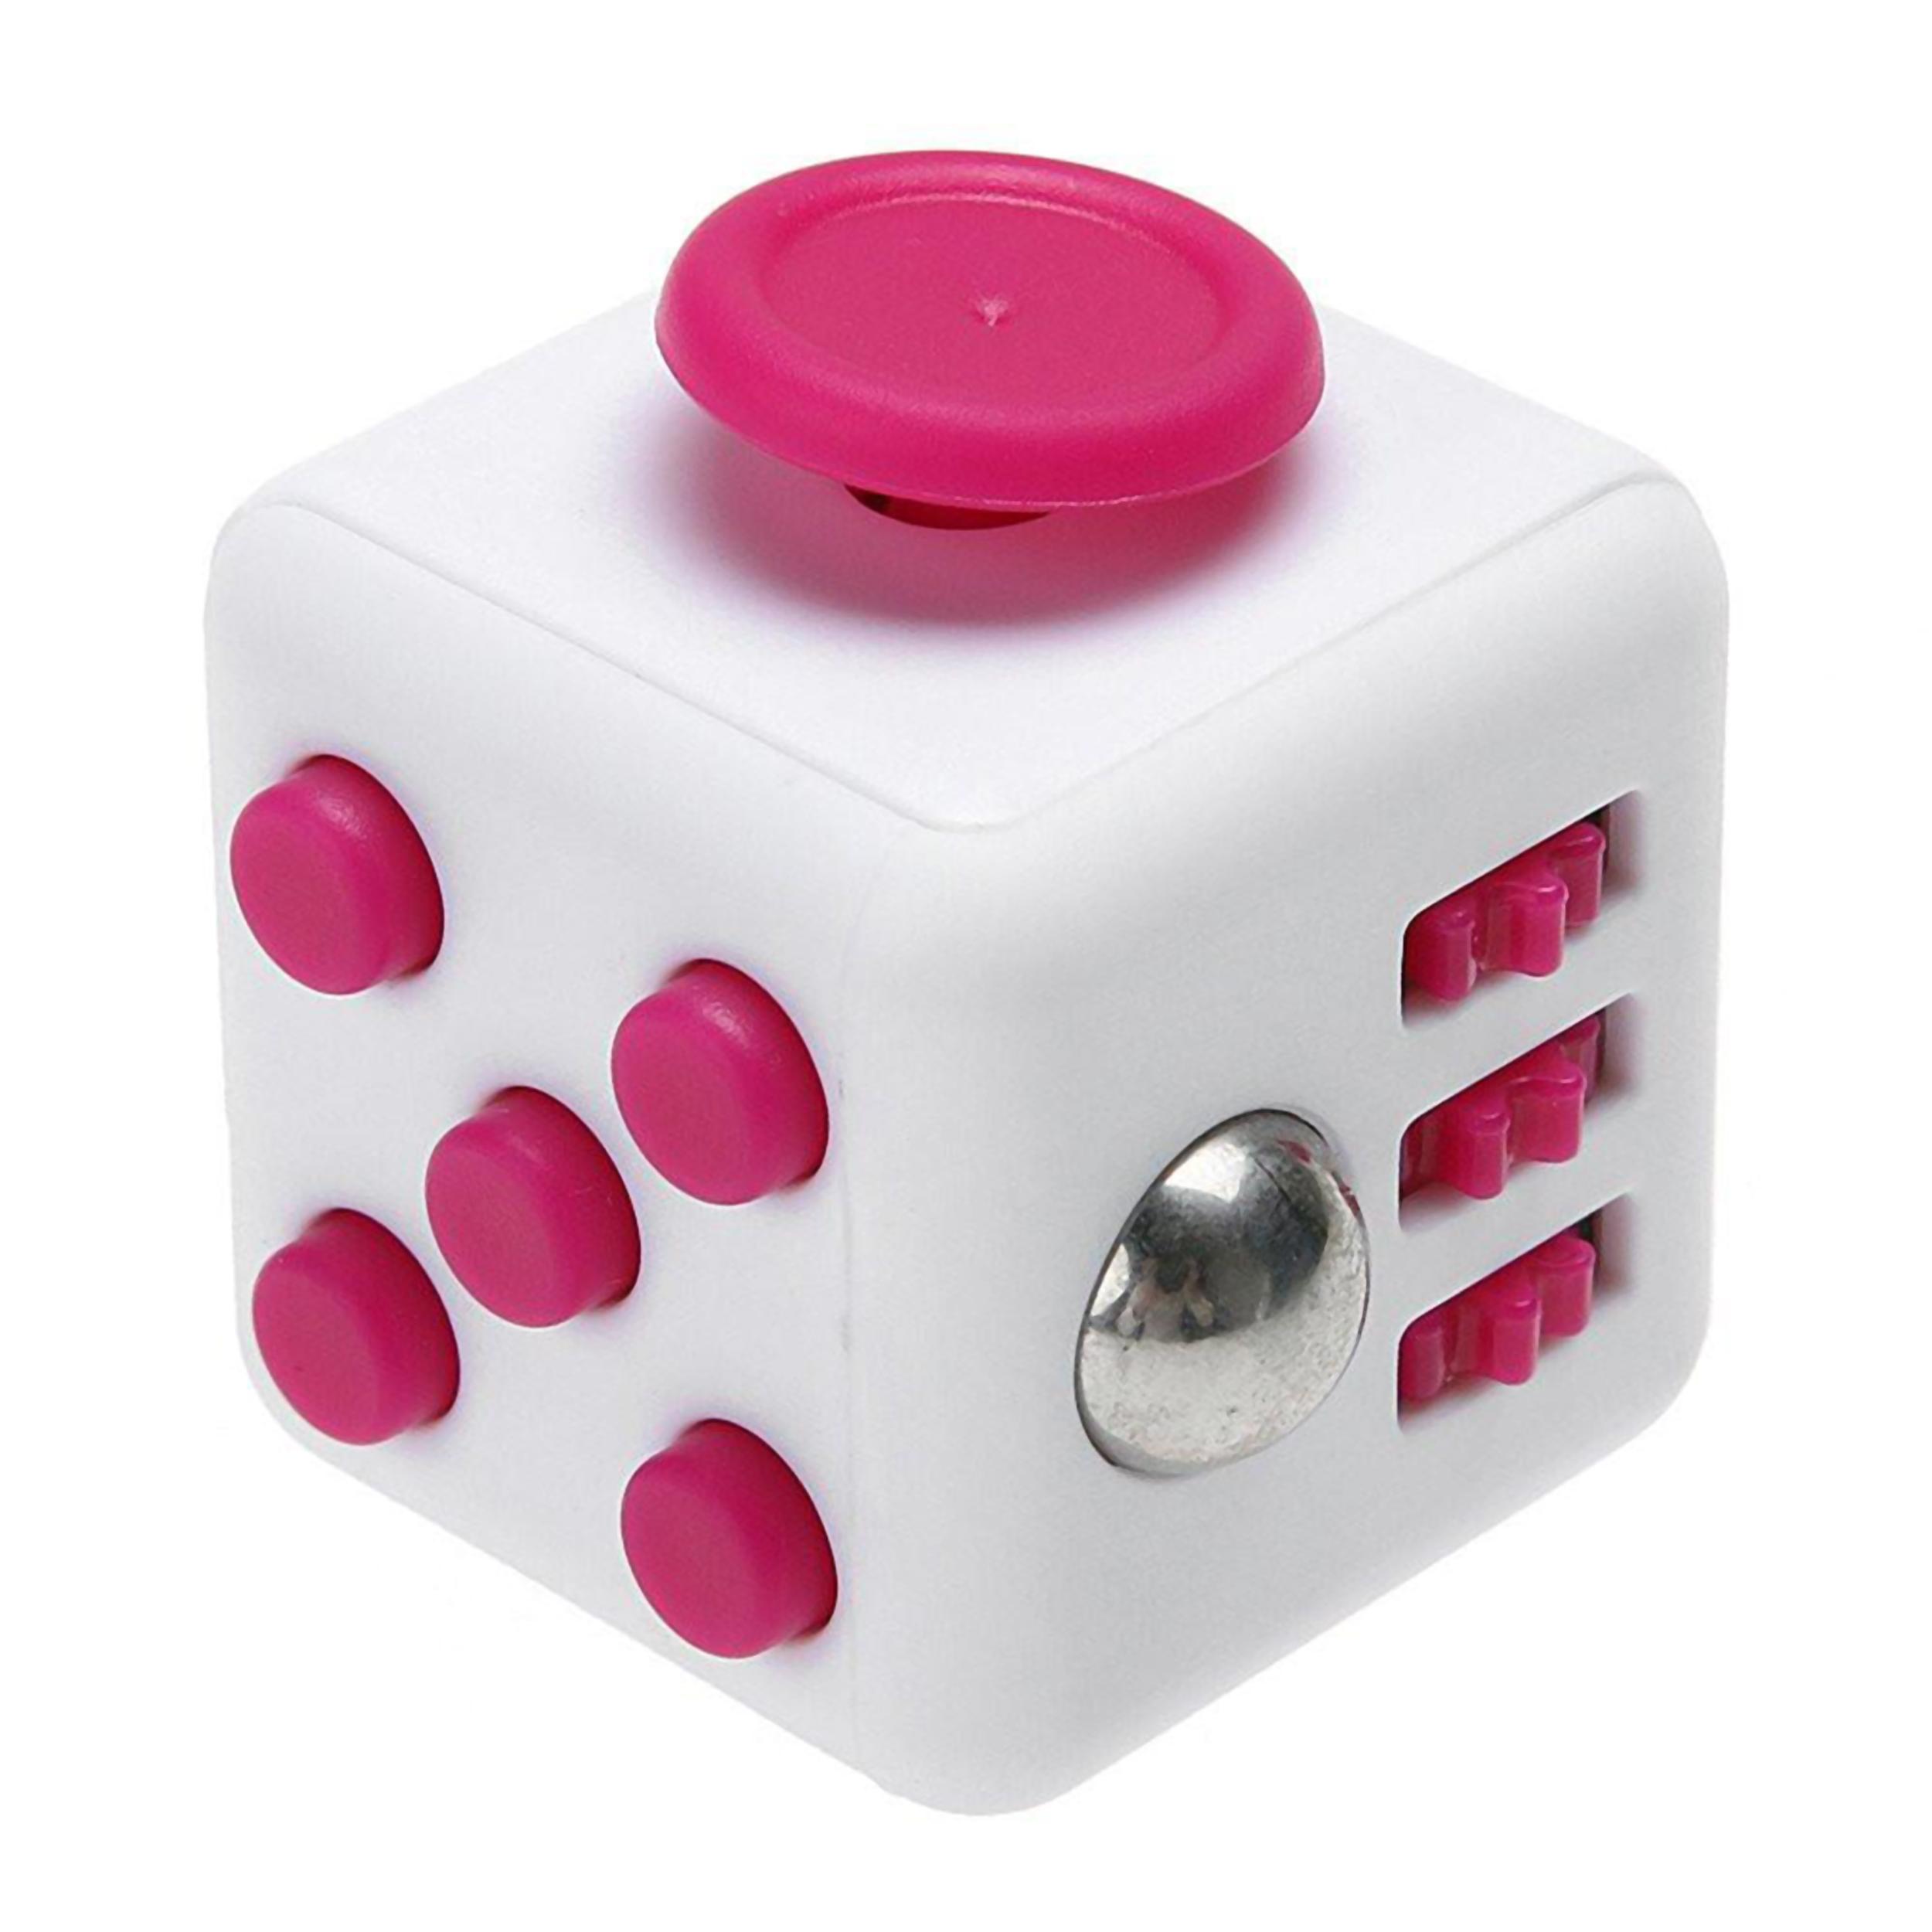 Fidget Cube Anti-Stresswürfel - Weiß/Pink